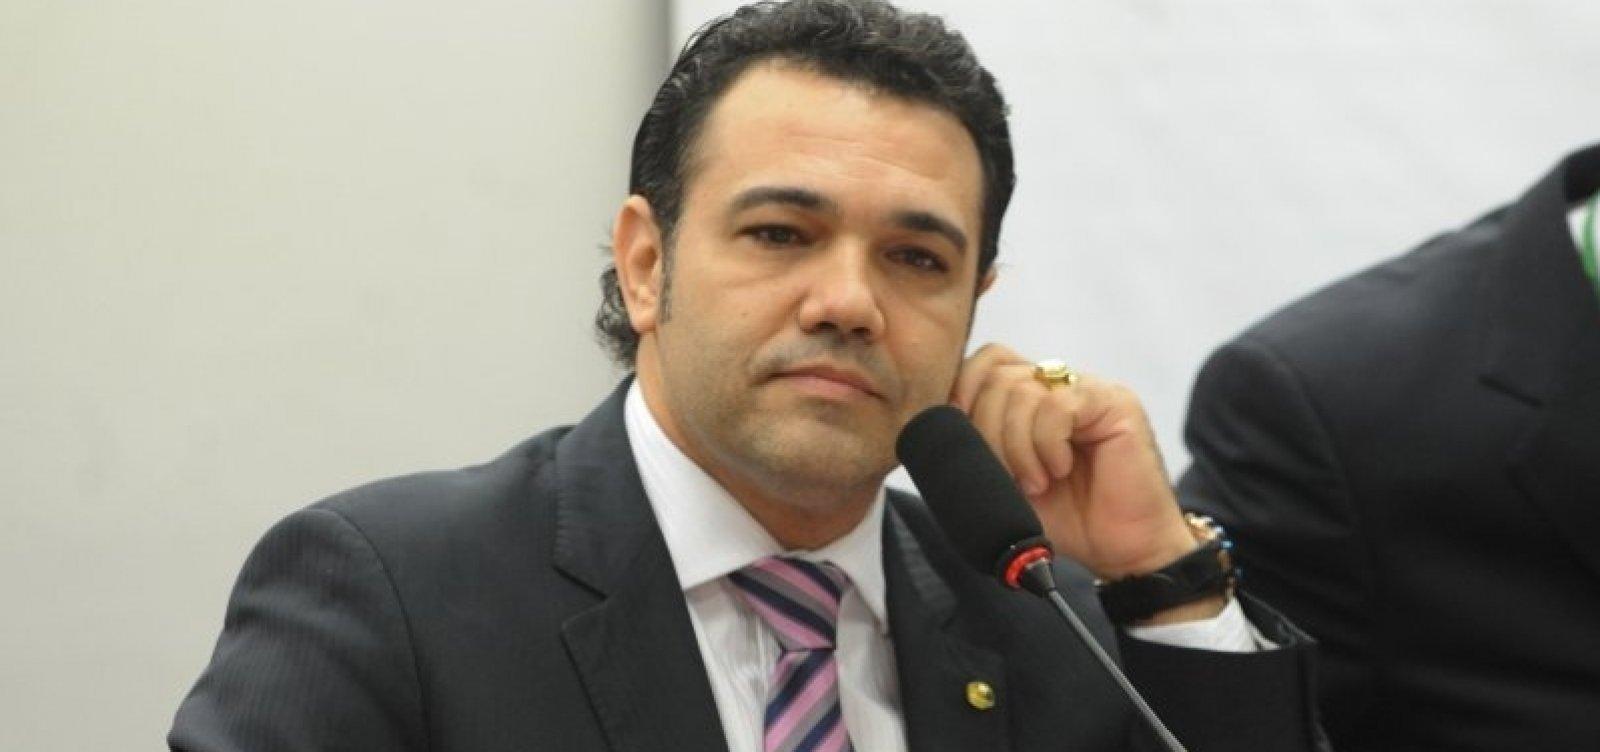 [Bolsonaro escolhe Feliciano como interlocutor preferencial, diz coluna]